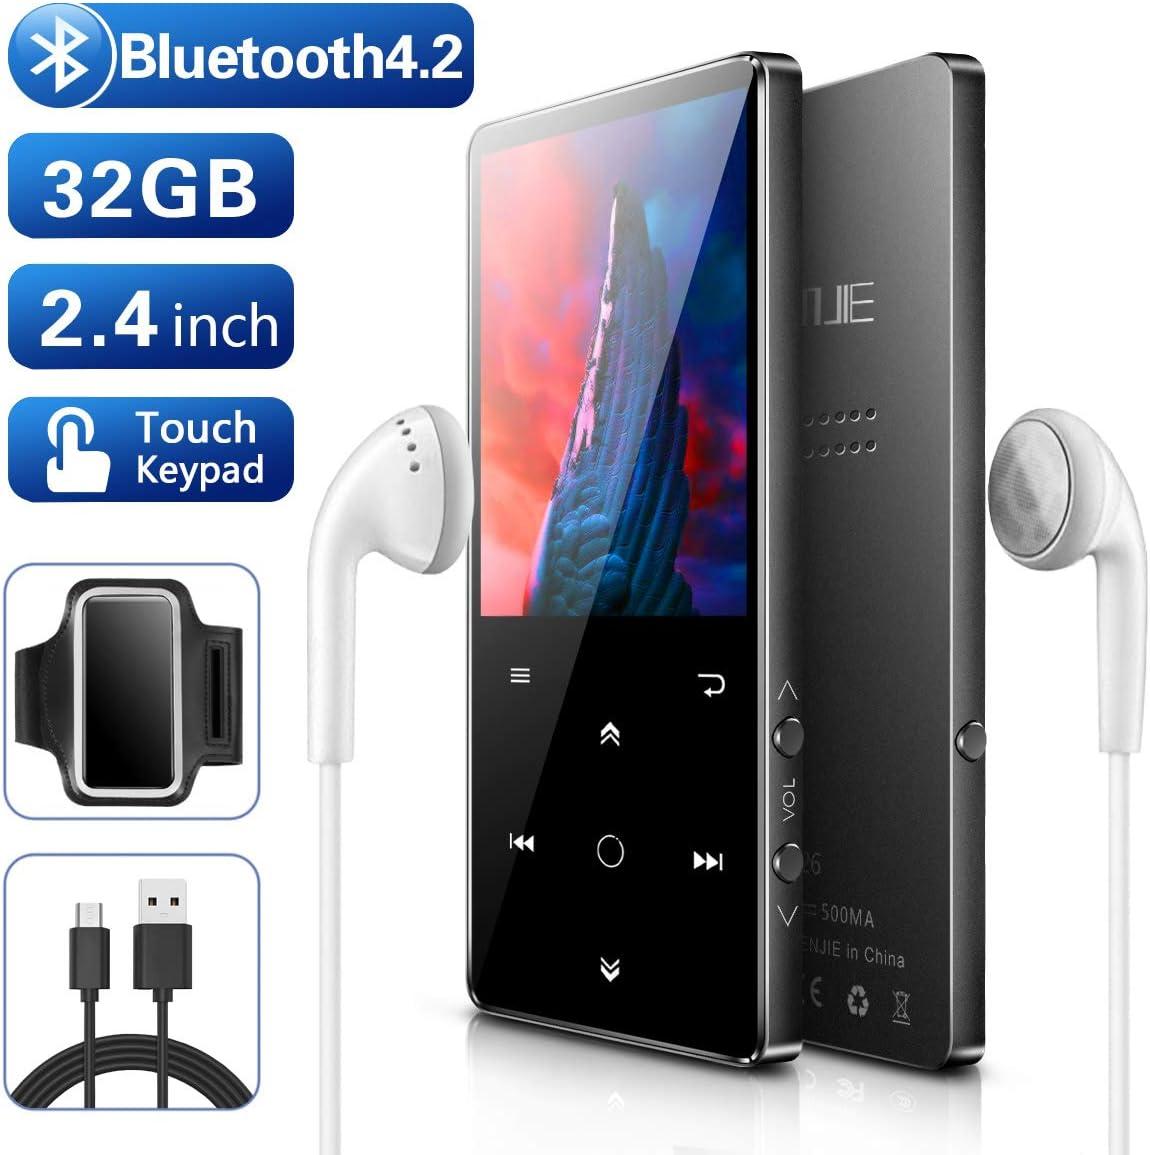 BENJIE 32 GB ampliable 128 GB reproducci/ón de v/ídeo//lectura de texto Reproductor MP3 de m/úsica Bluetooth HiFi de 2,4 pulgadas con radio FM//grabadora de voz